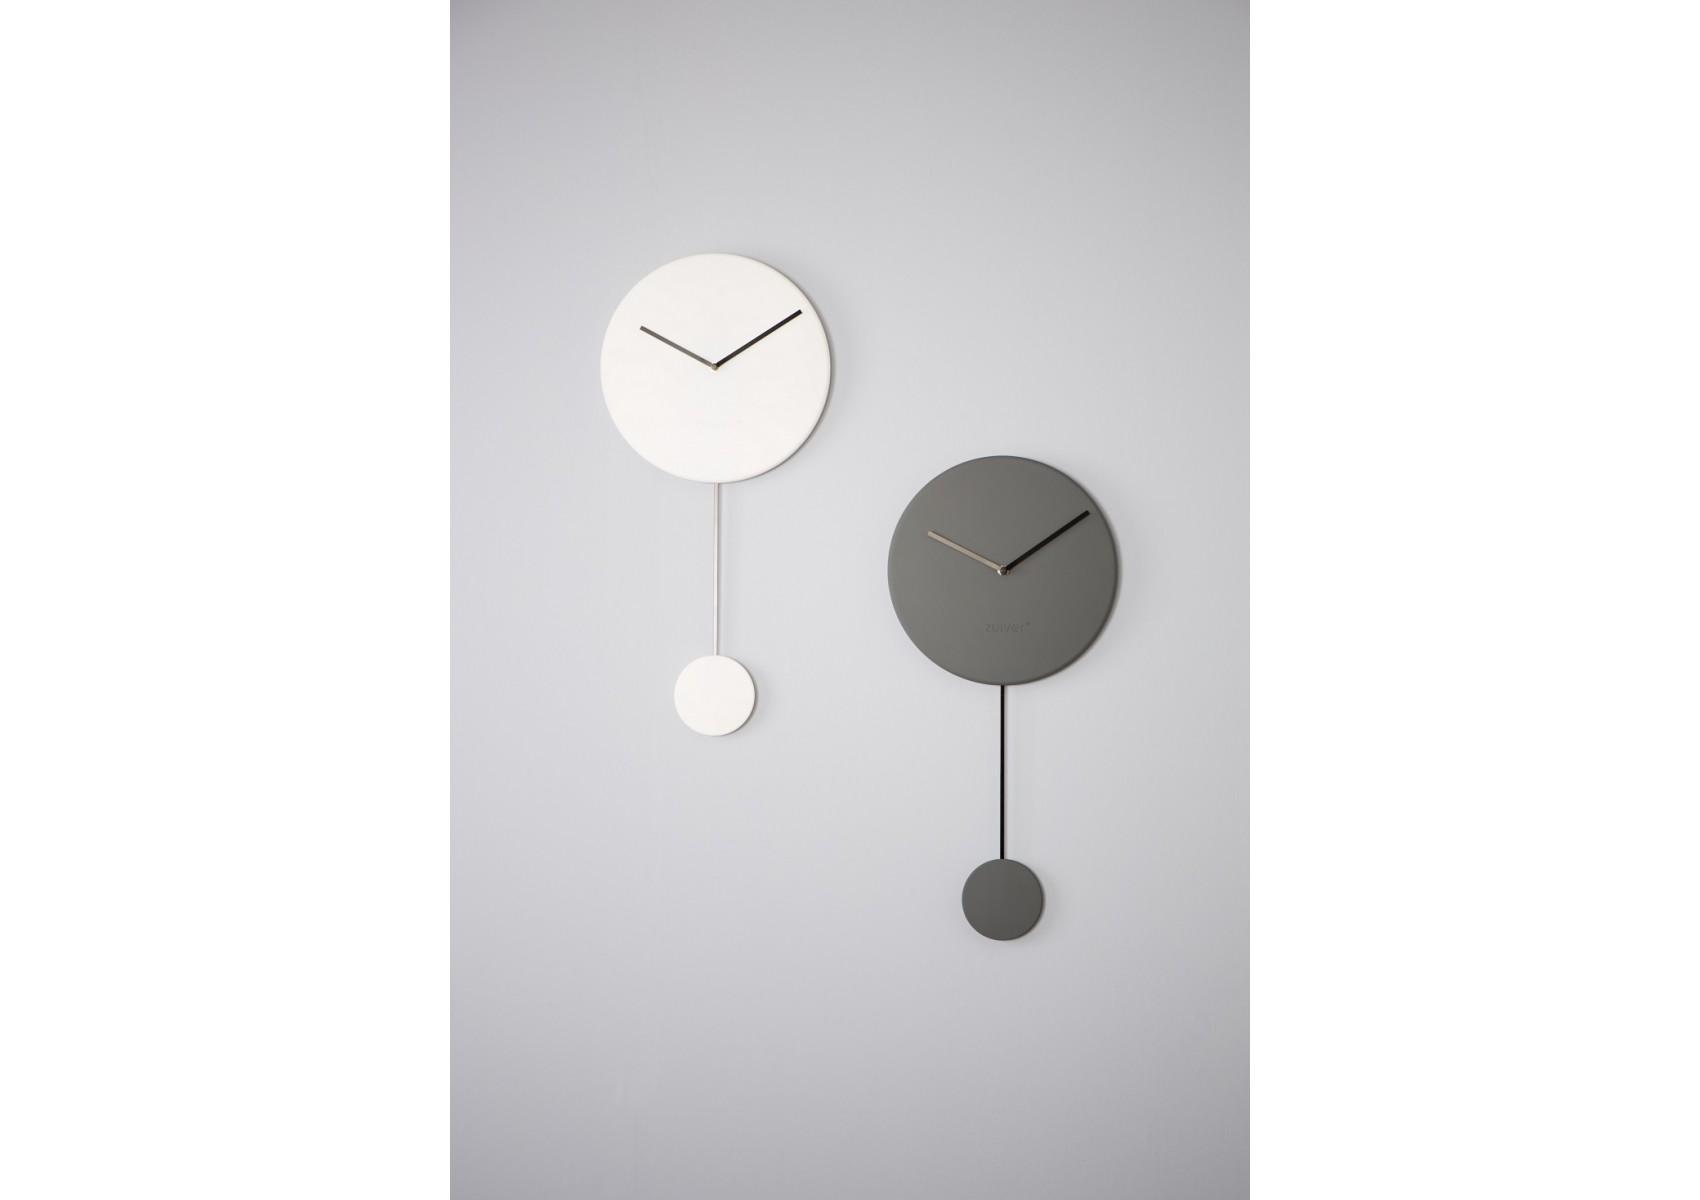 horloge design en pendule de la collection minimal de chez zuiver. Black Bedroom Furniture Sets. Home Design Ideas